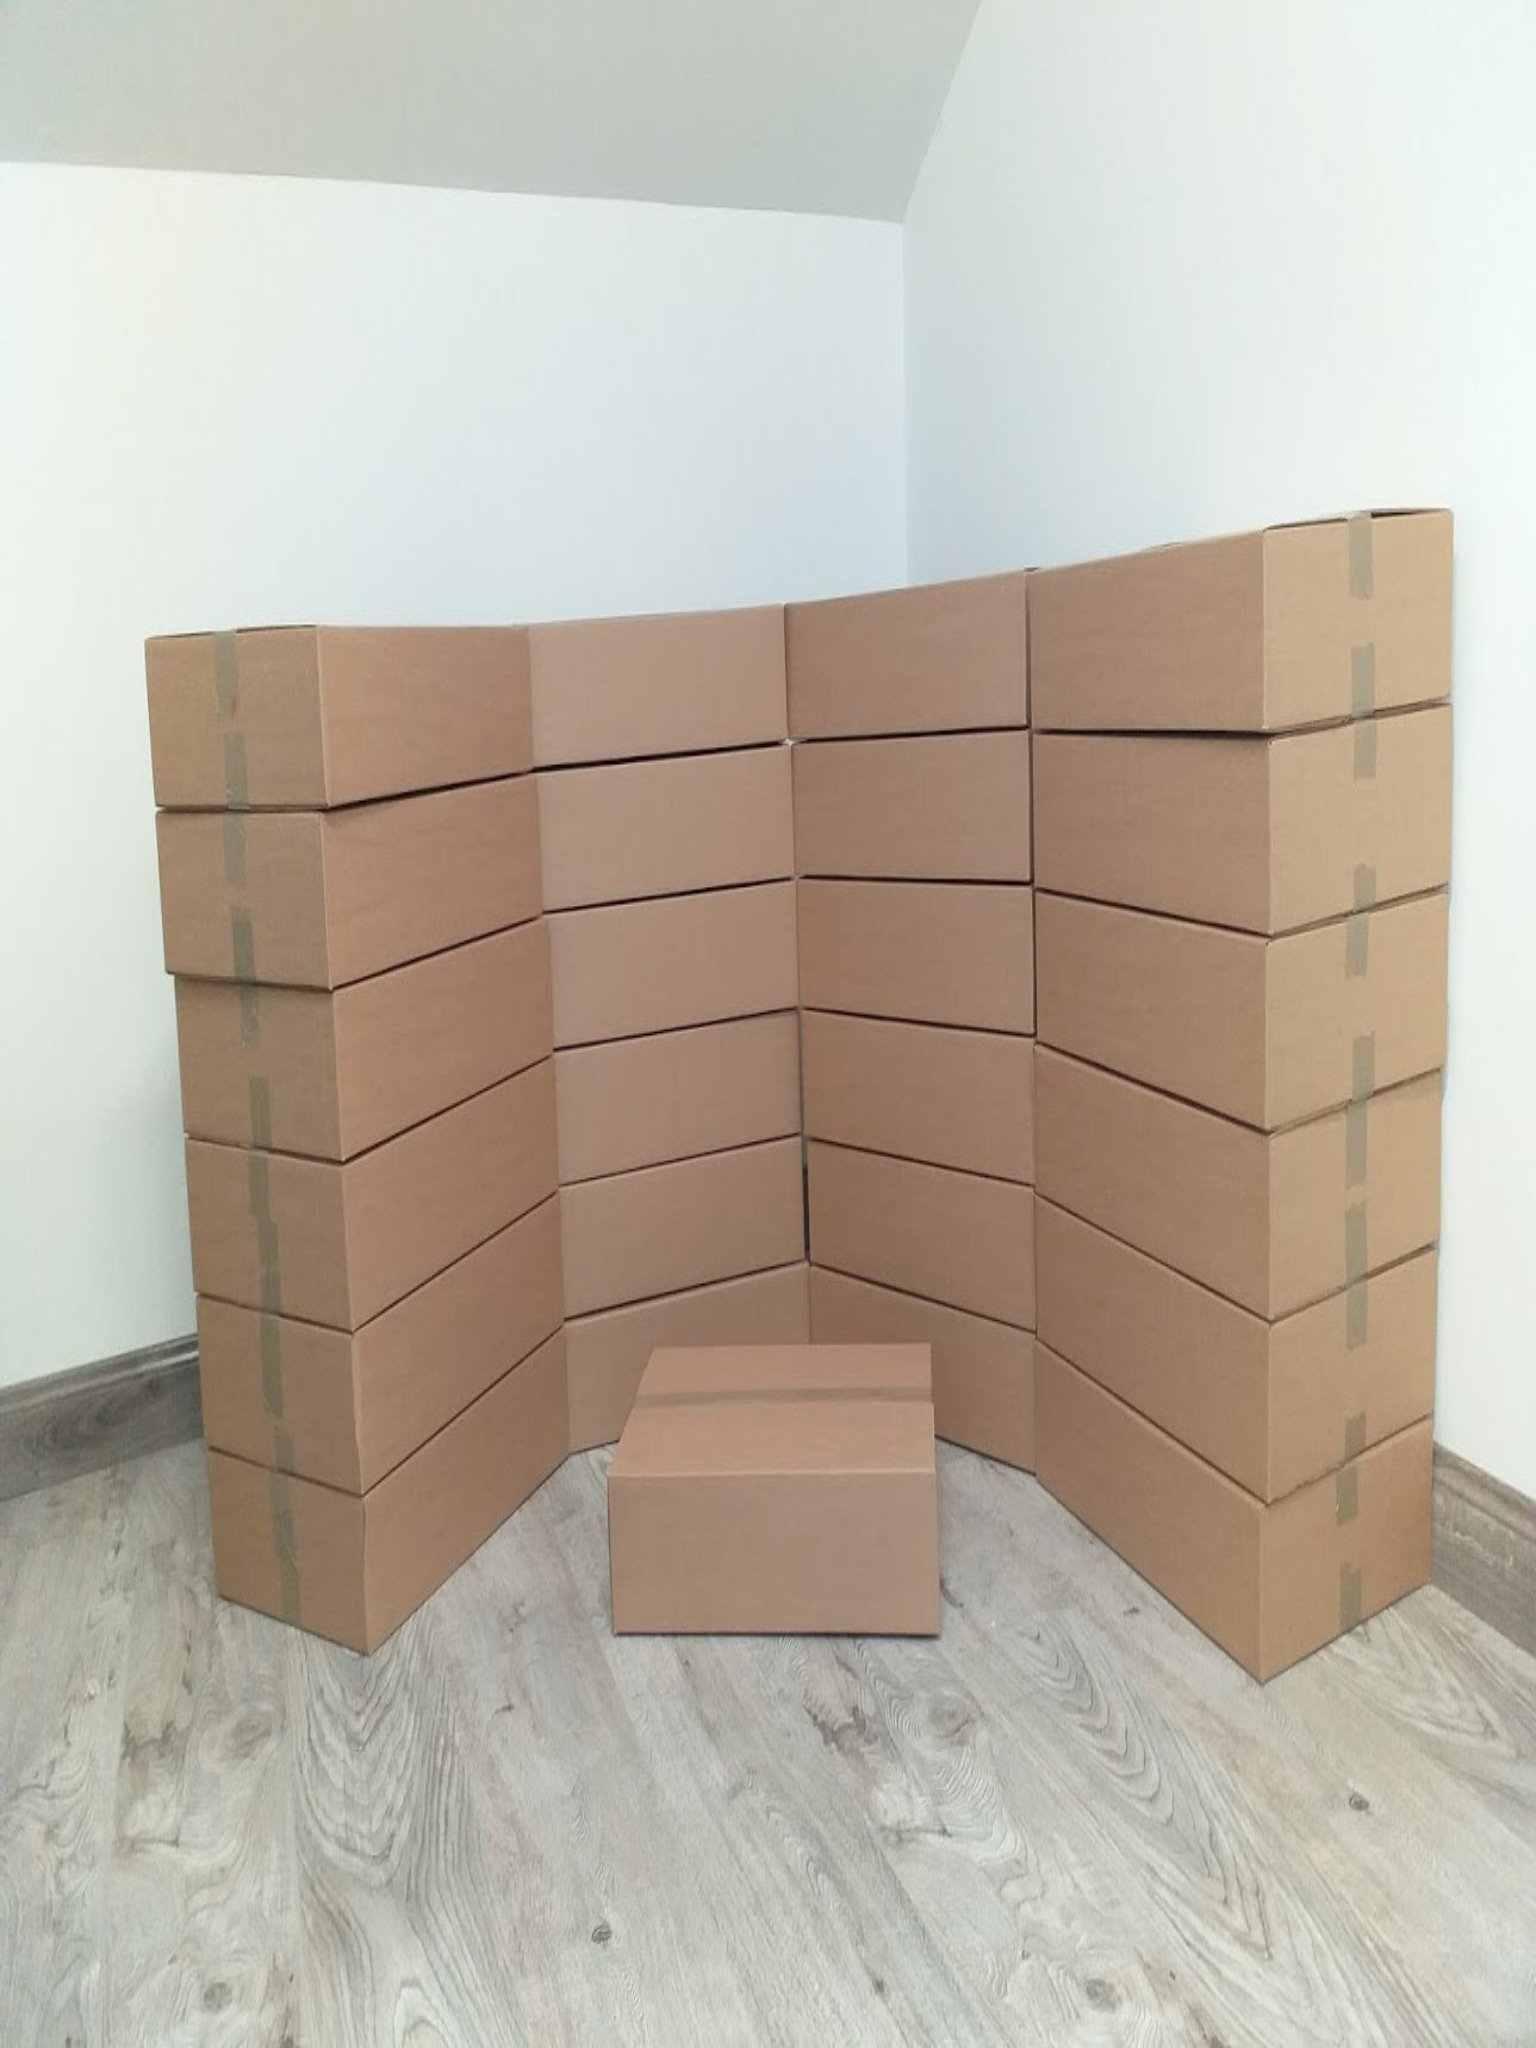 single wall boxes